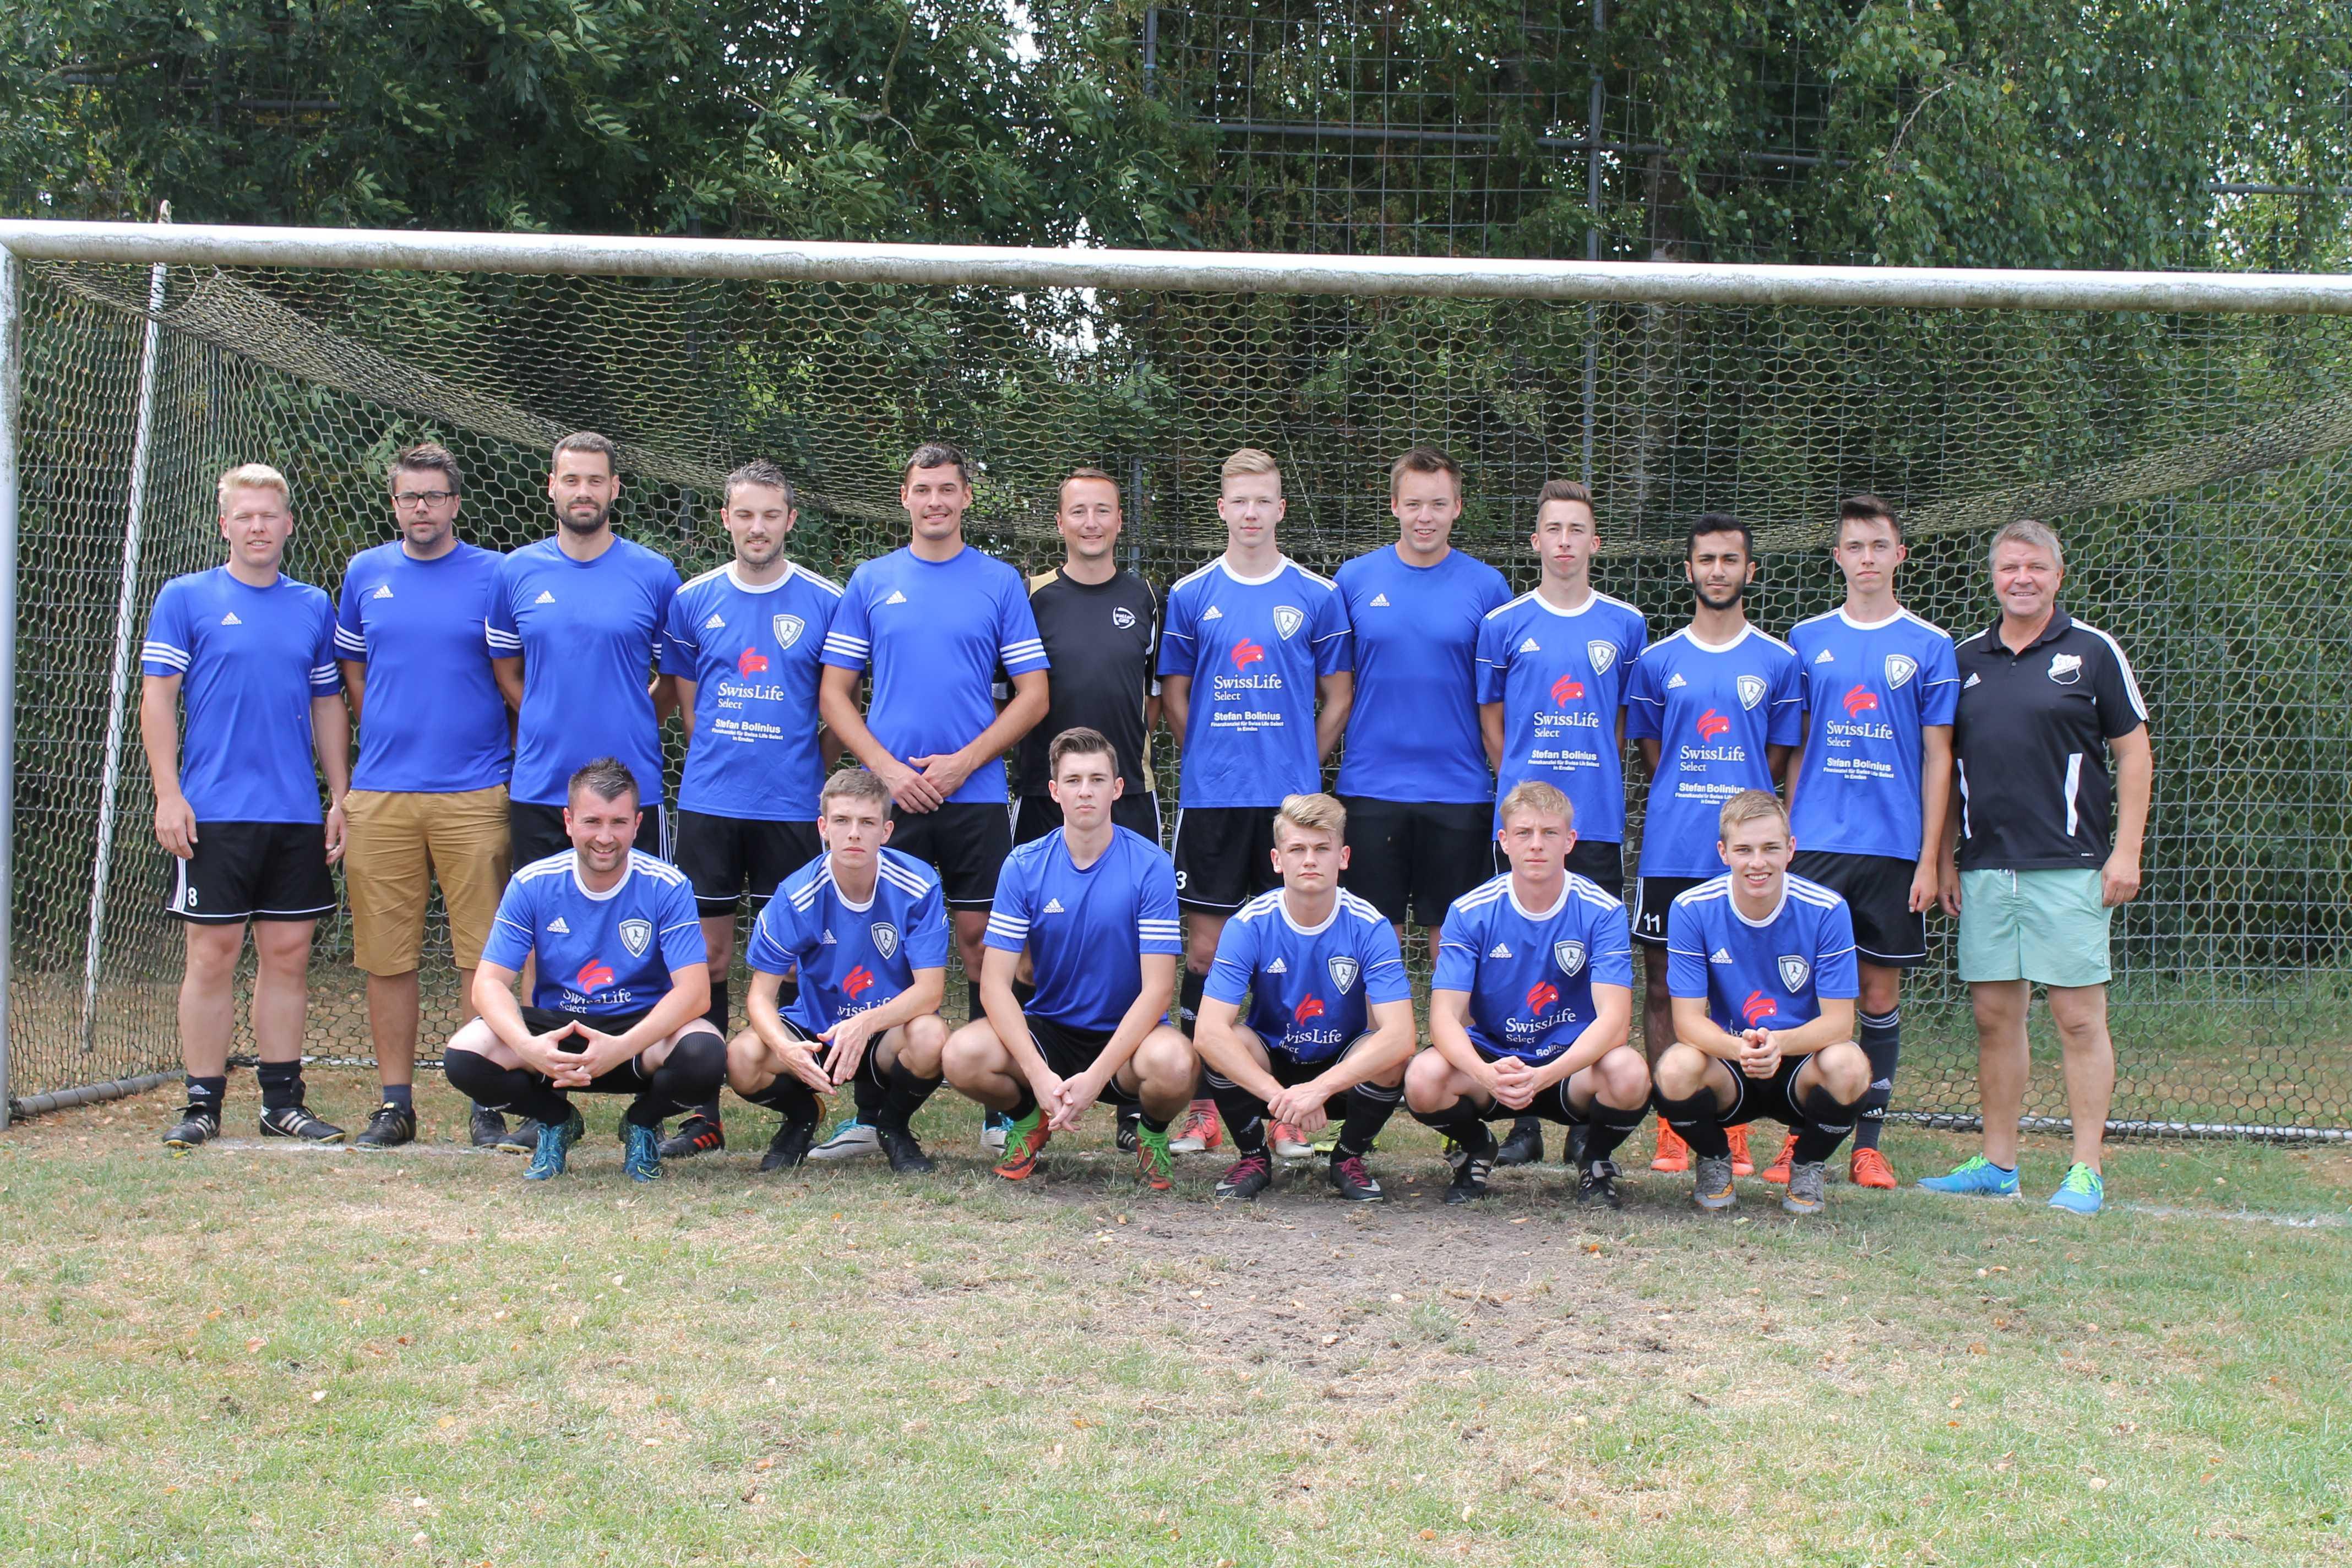 2018-07-29 Sportwoche - Sportpicknick & Football & Fußball (22)